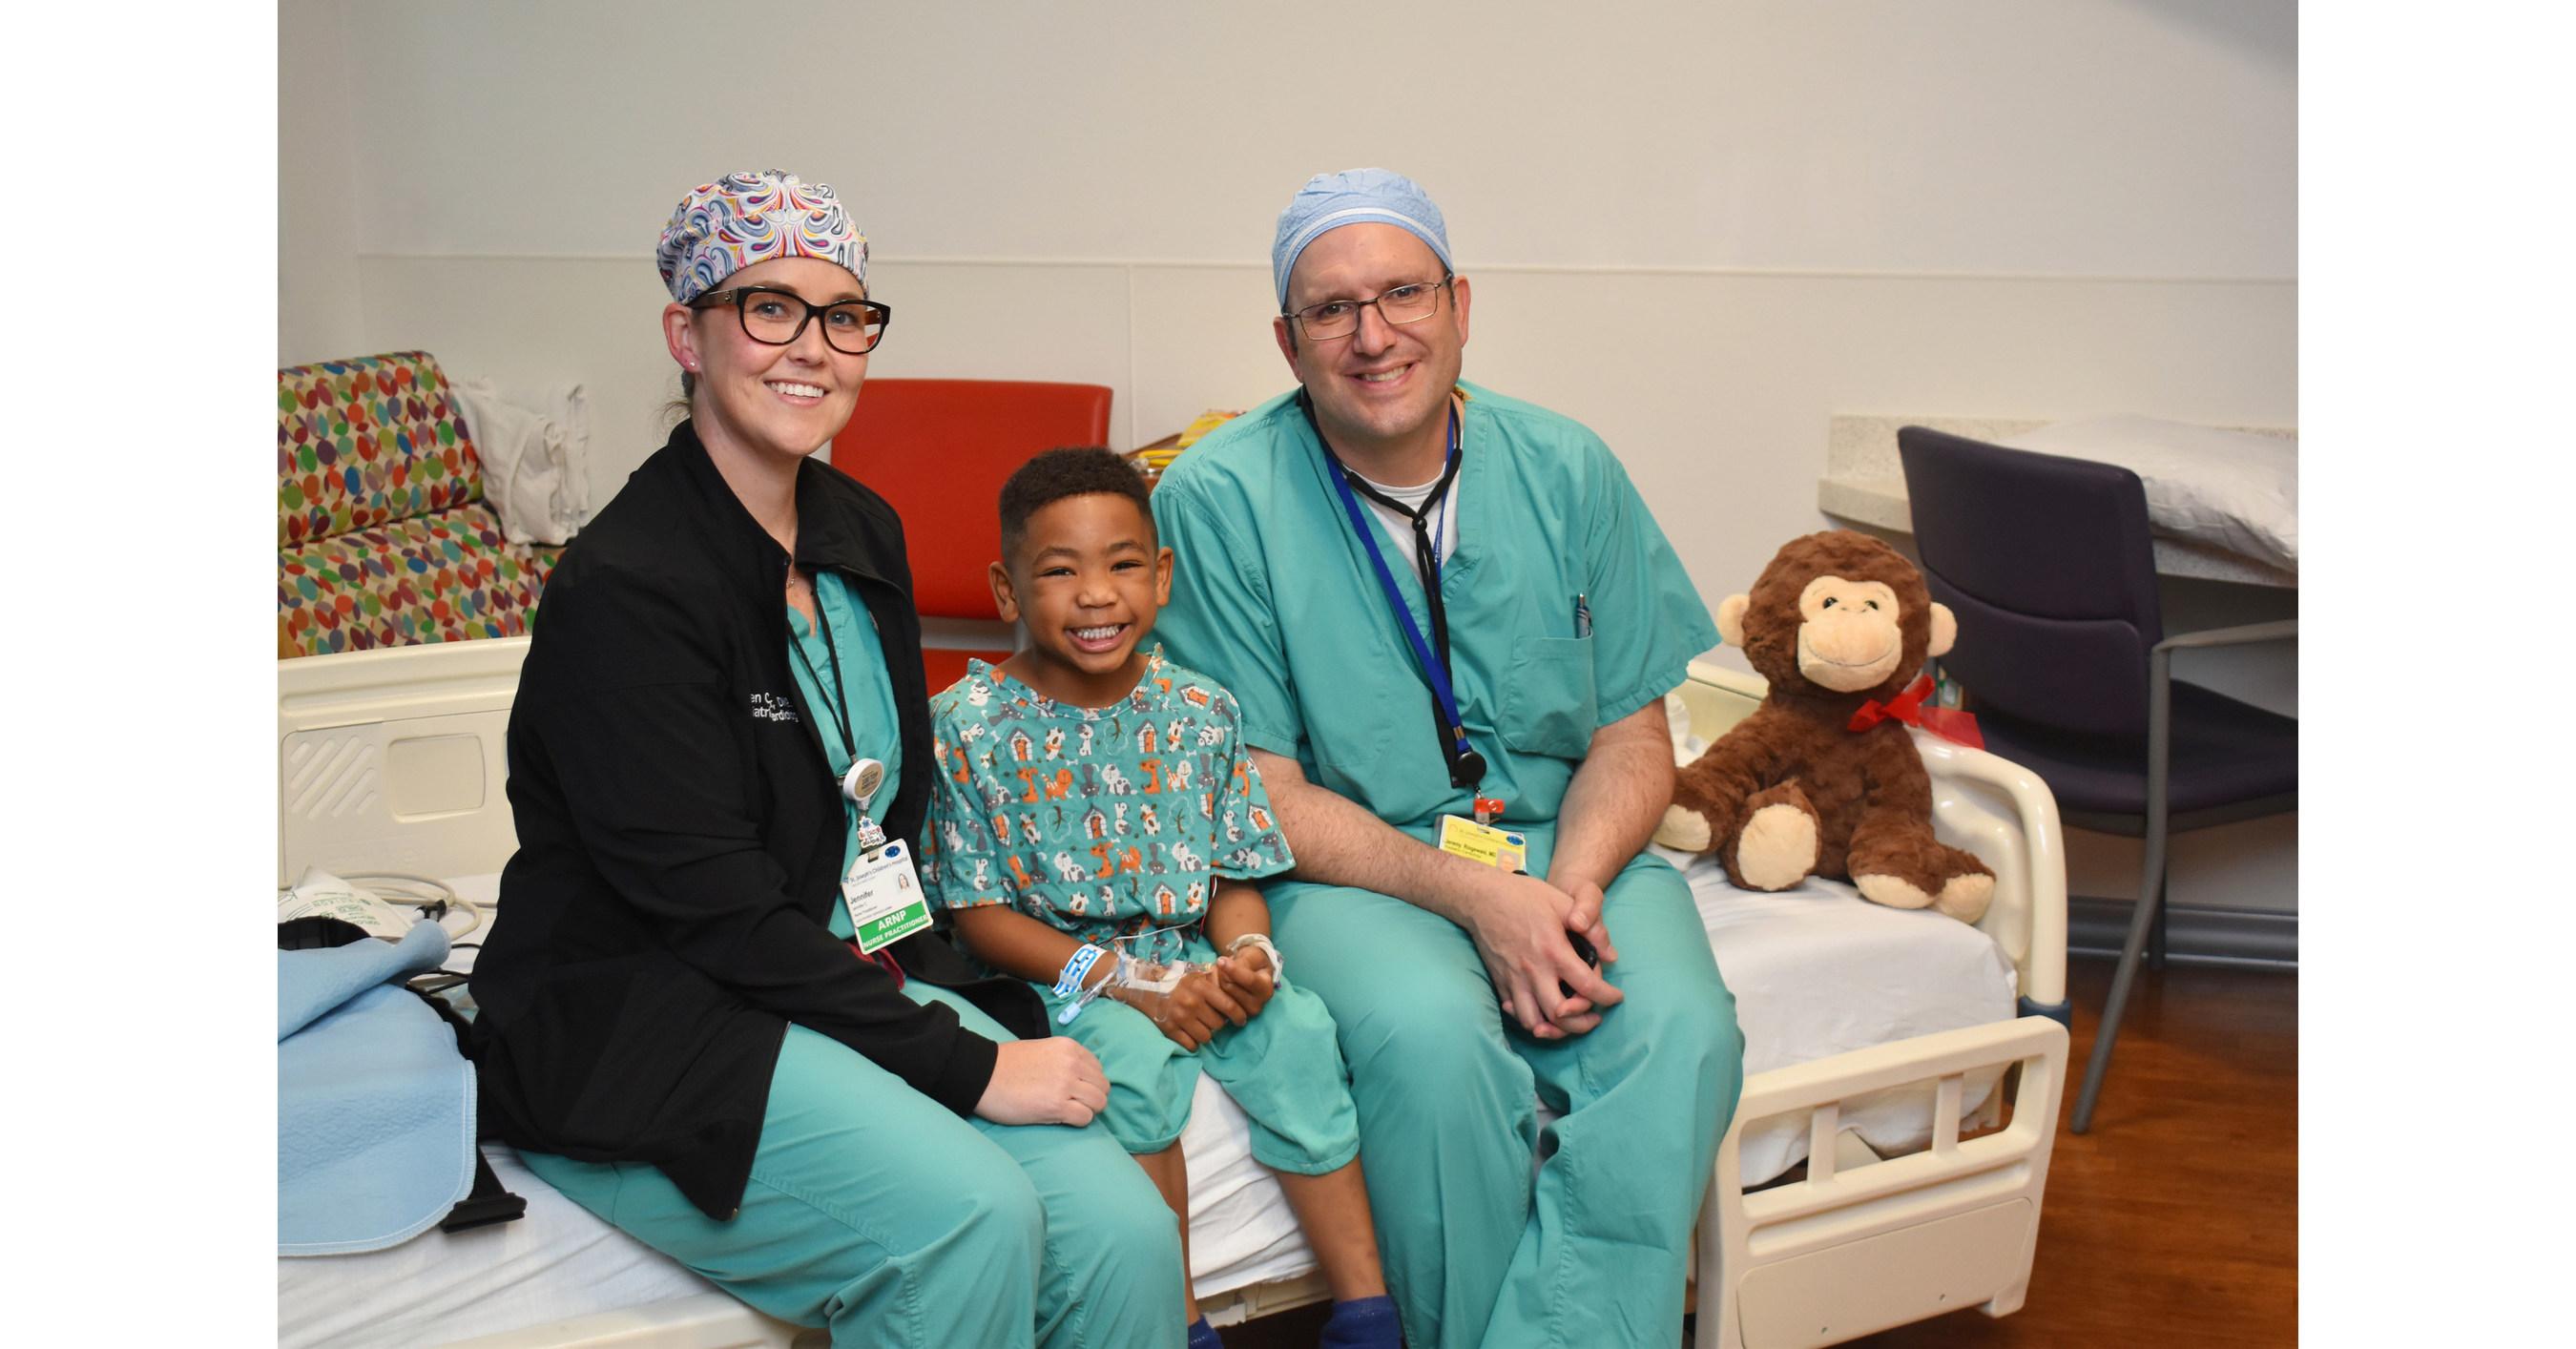 5 Year Old Jaycob with Dr  Ringewald jpg?p=facebook.